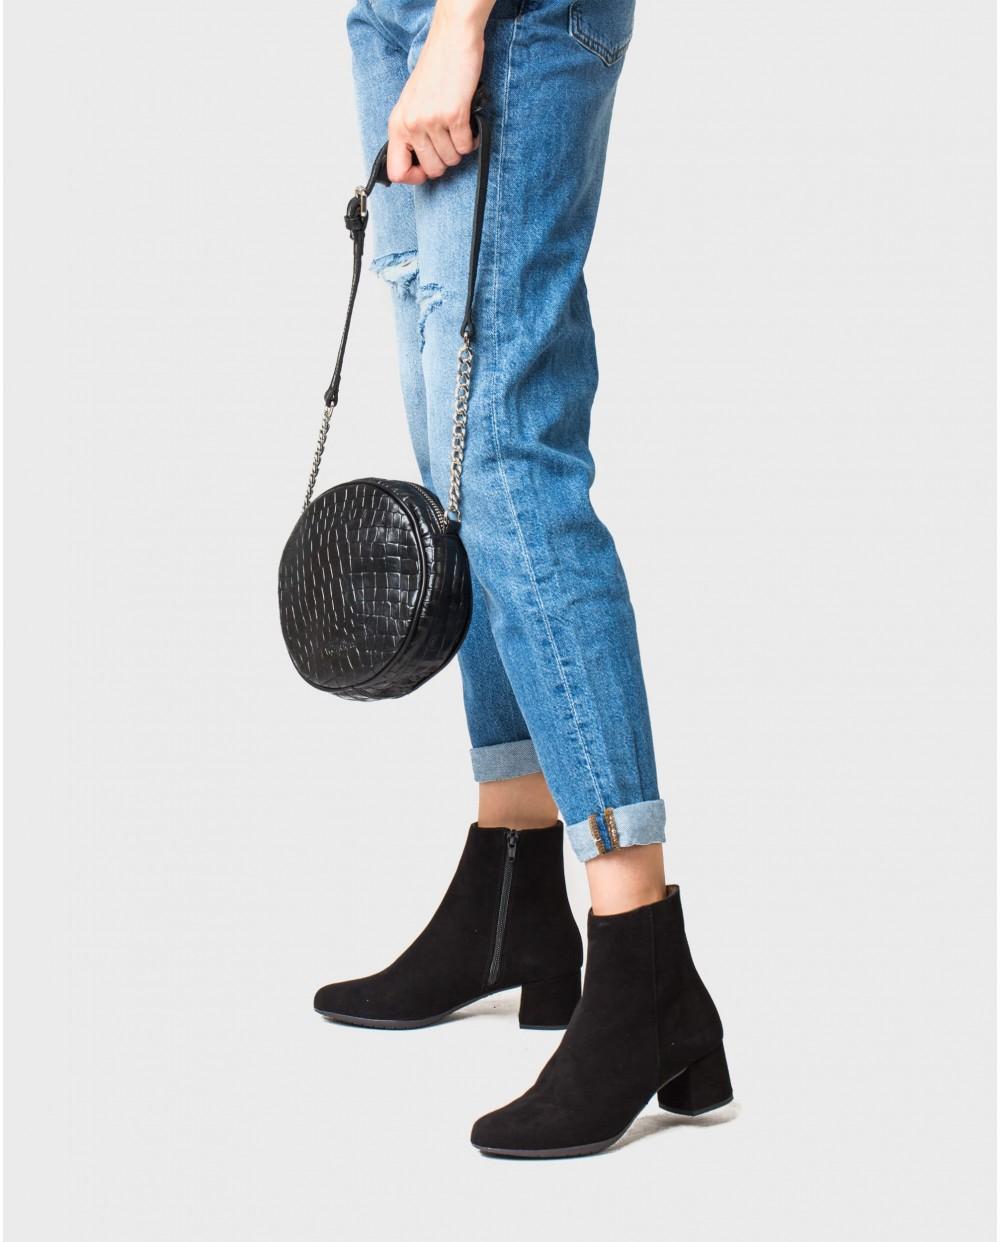 Wonders-Bags 30% OFF-Circular handbag with crossbody strap